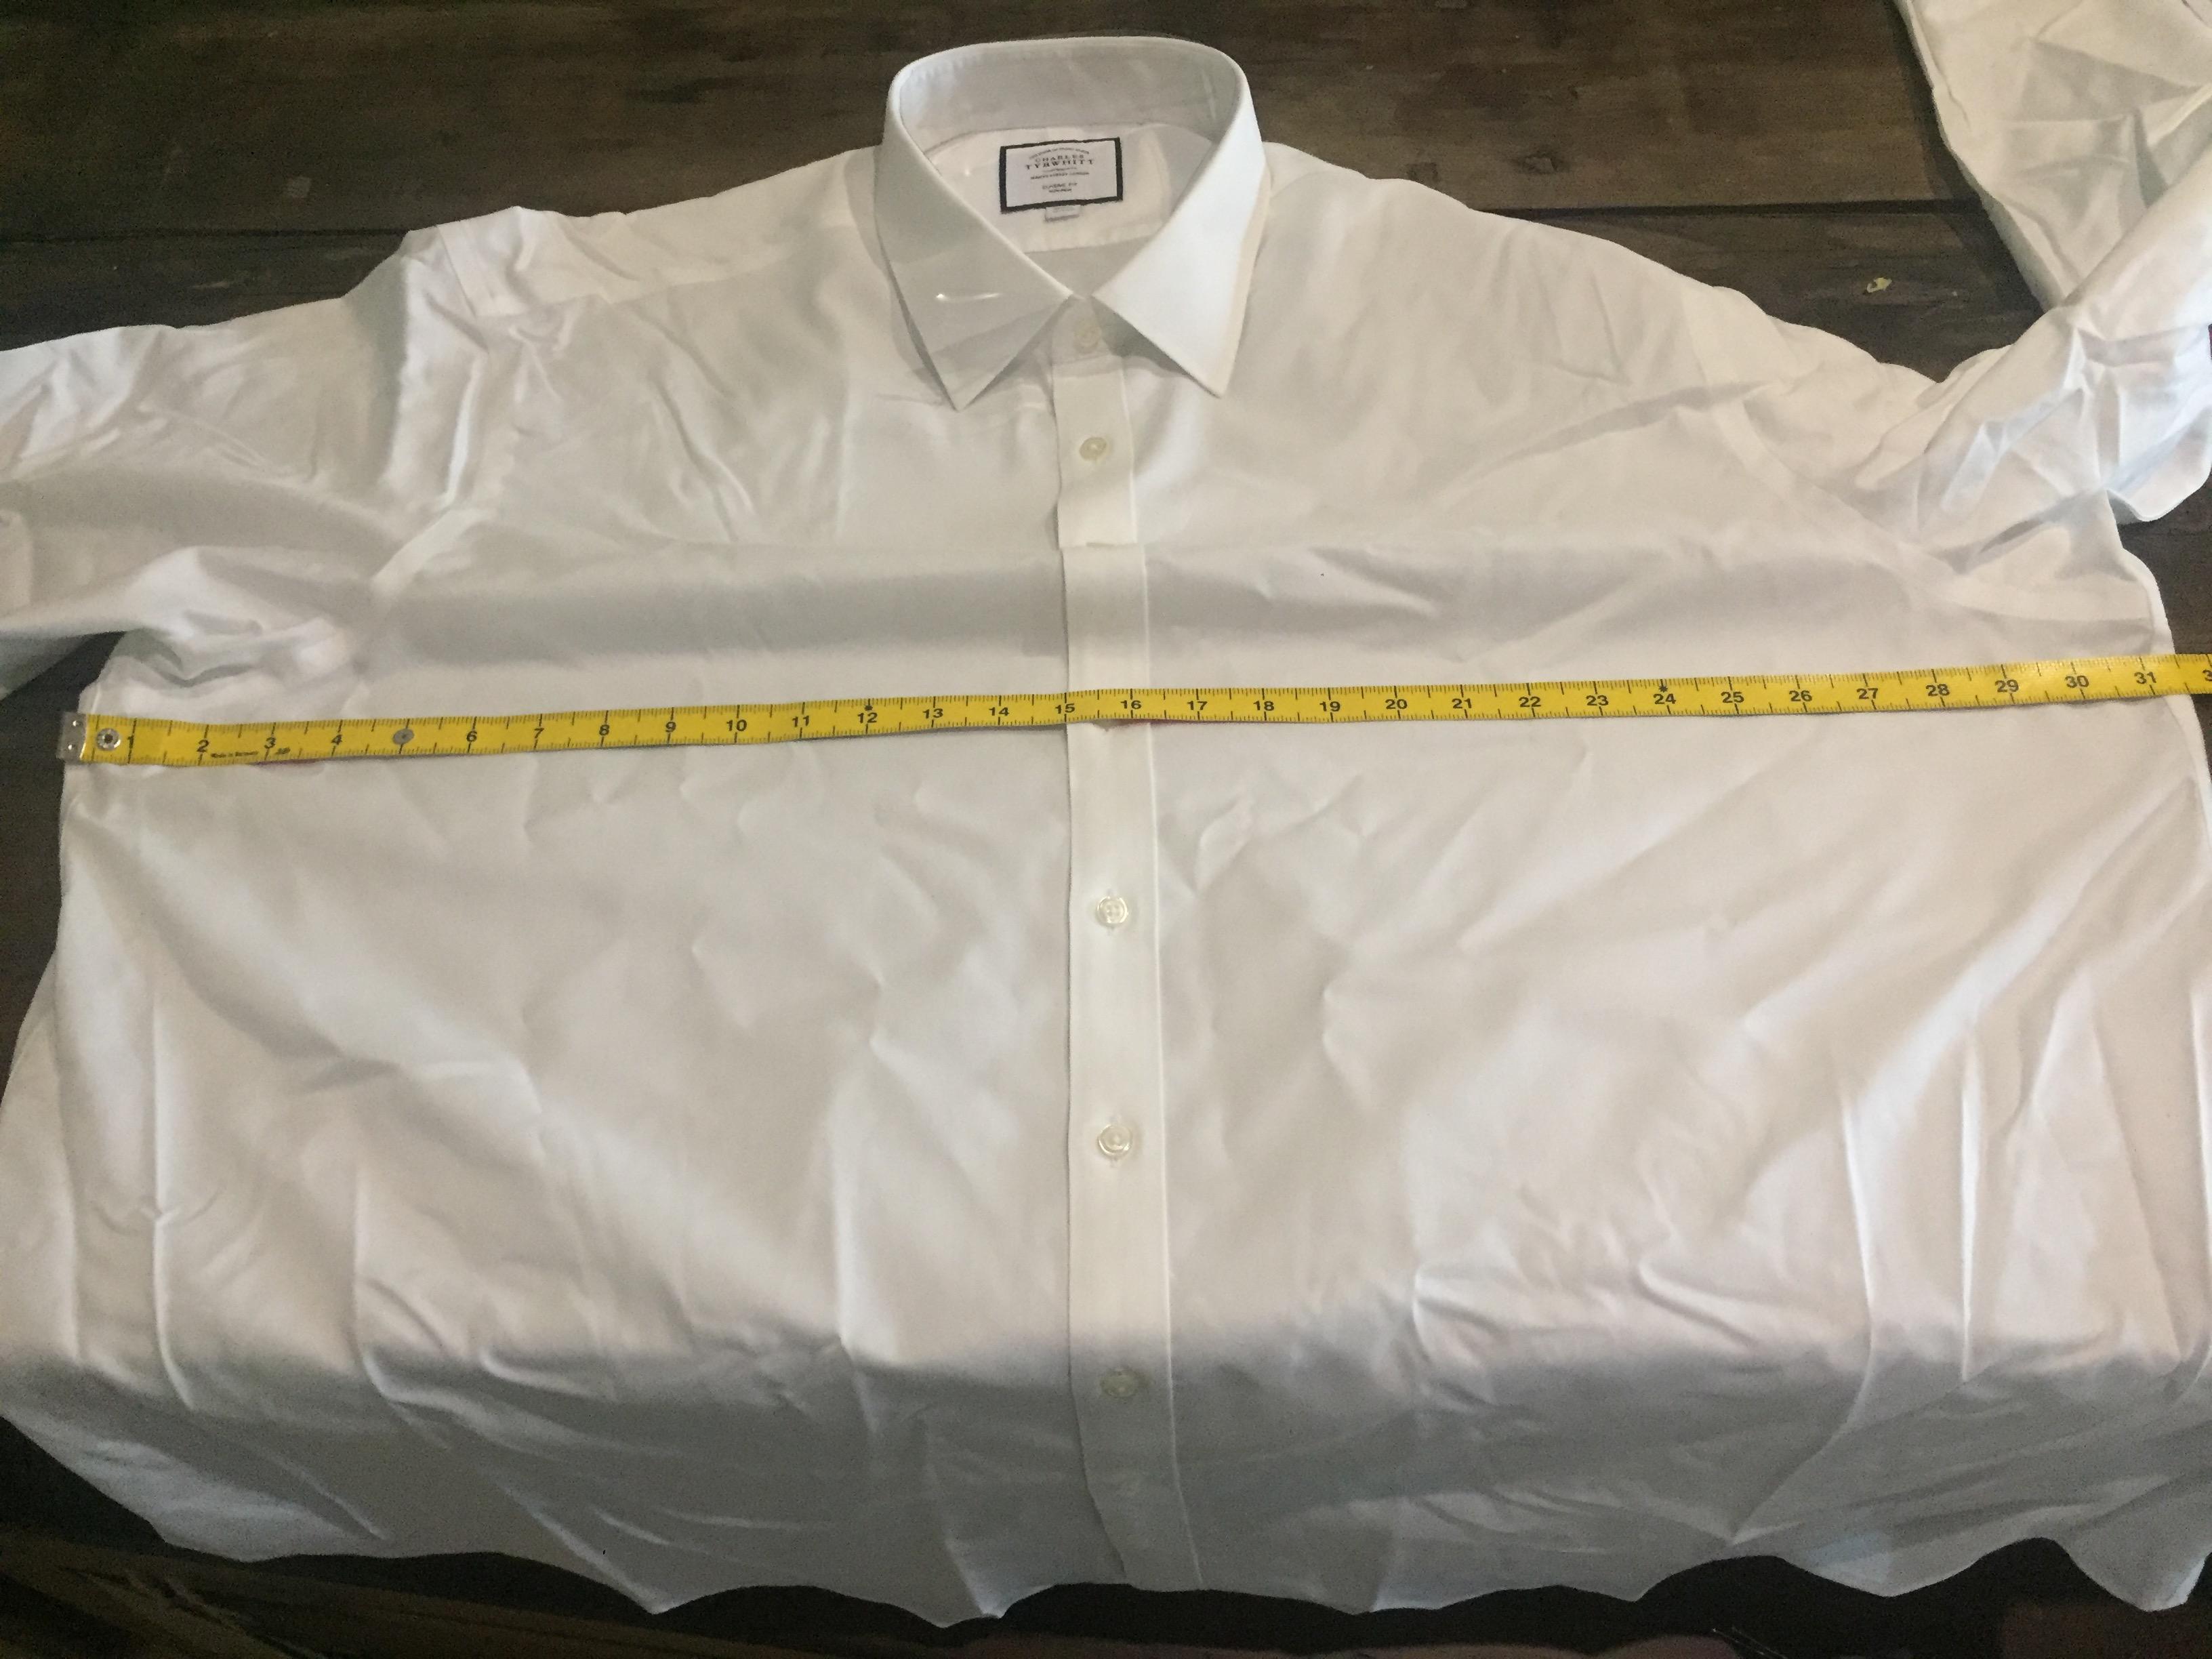 Charles Tyrwhitt Classic Fit 20 inch collar